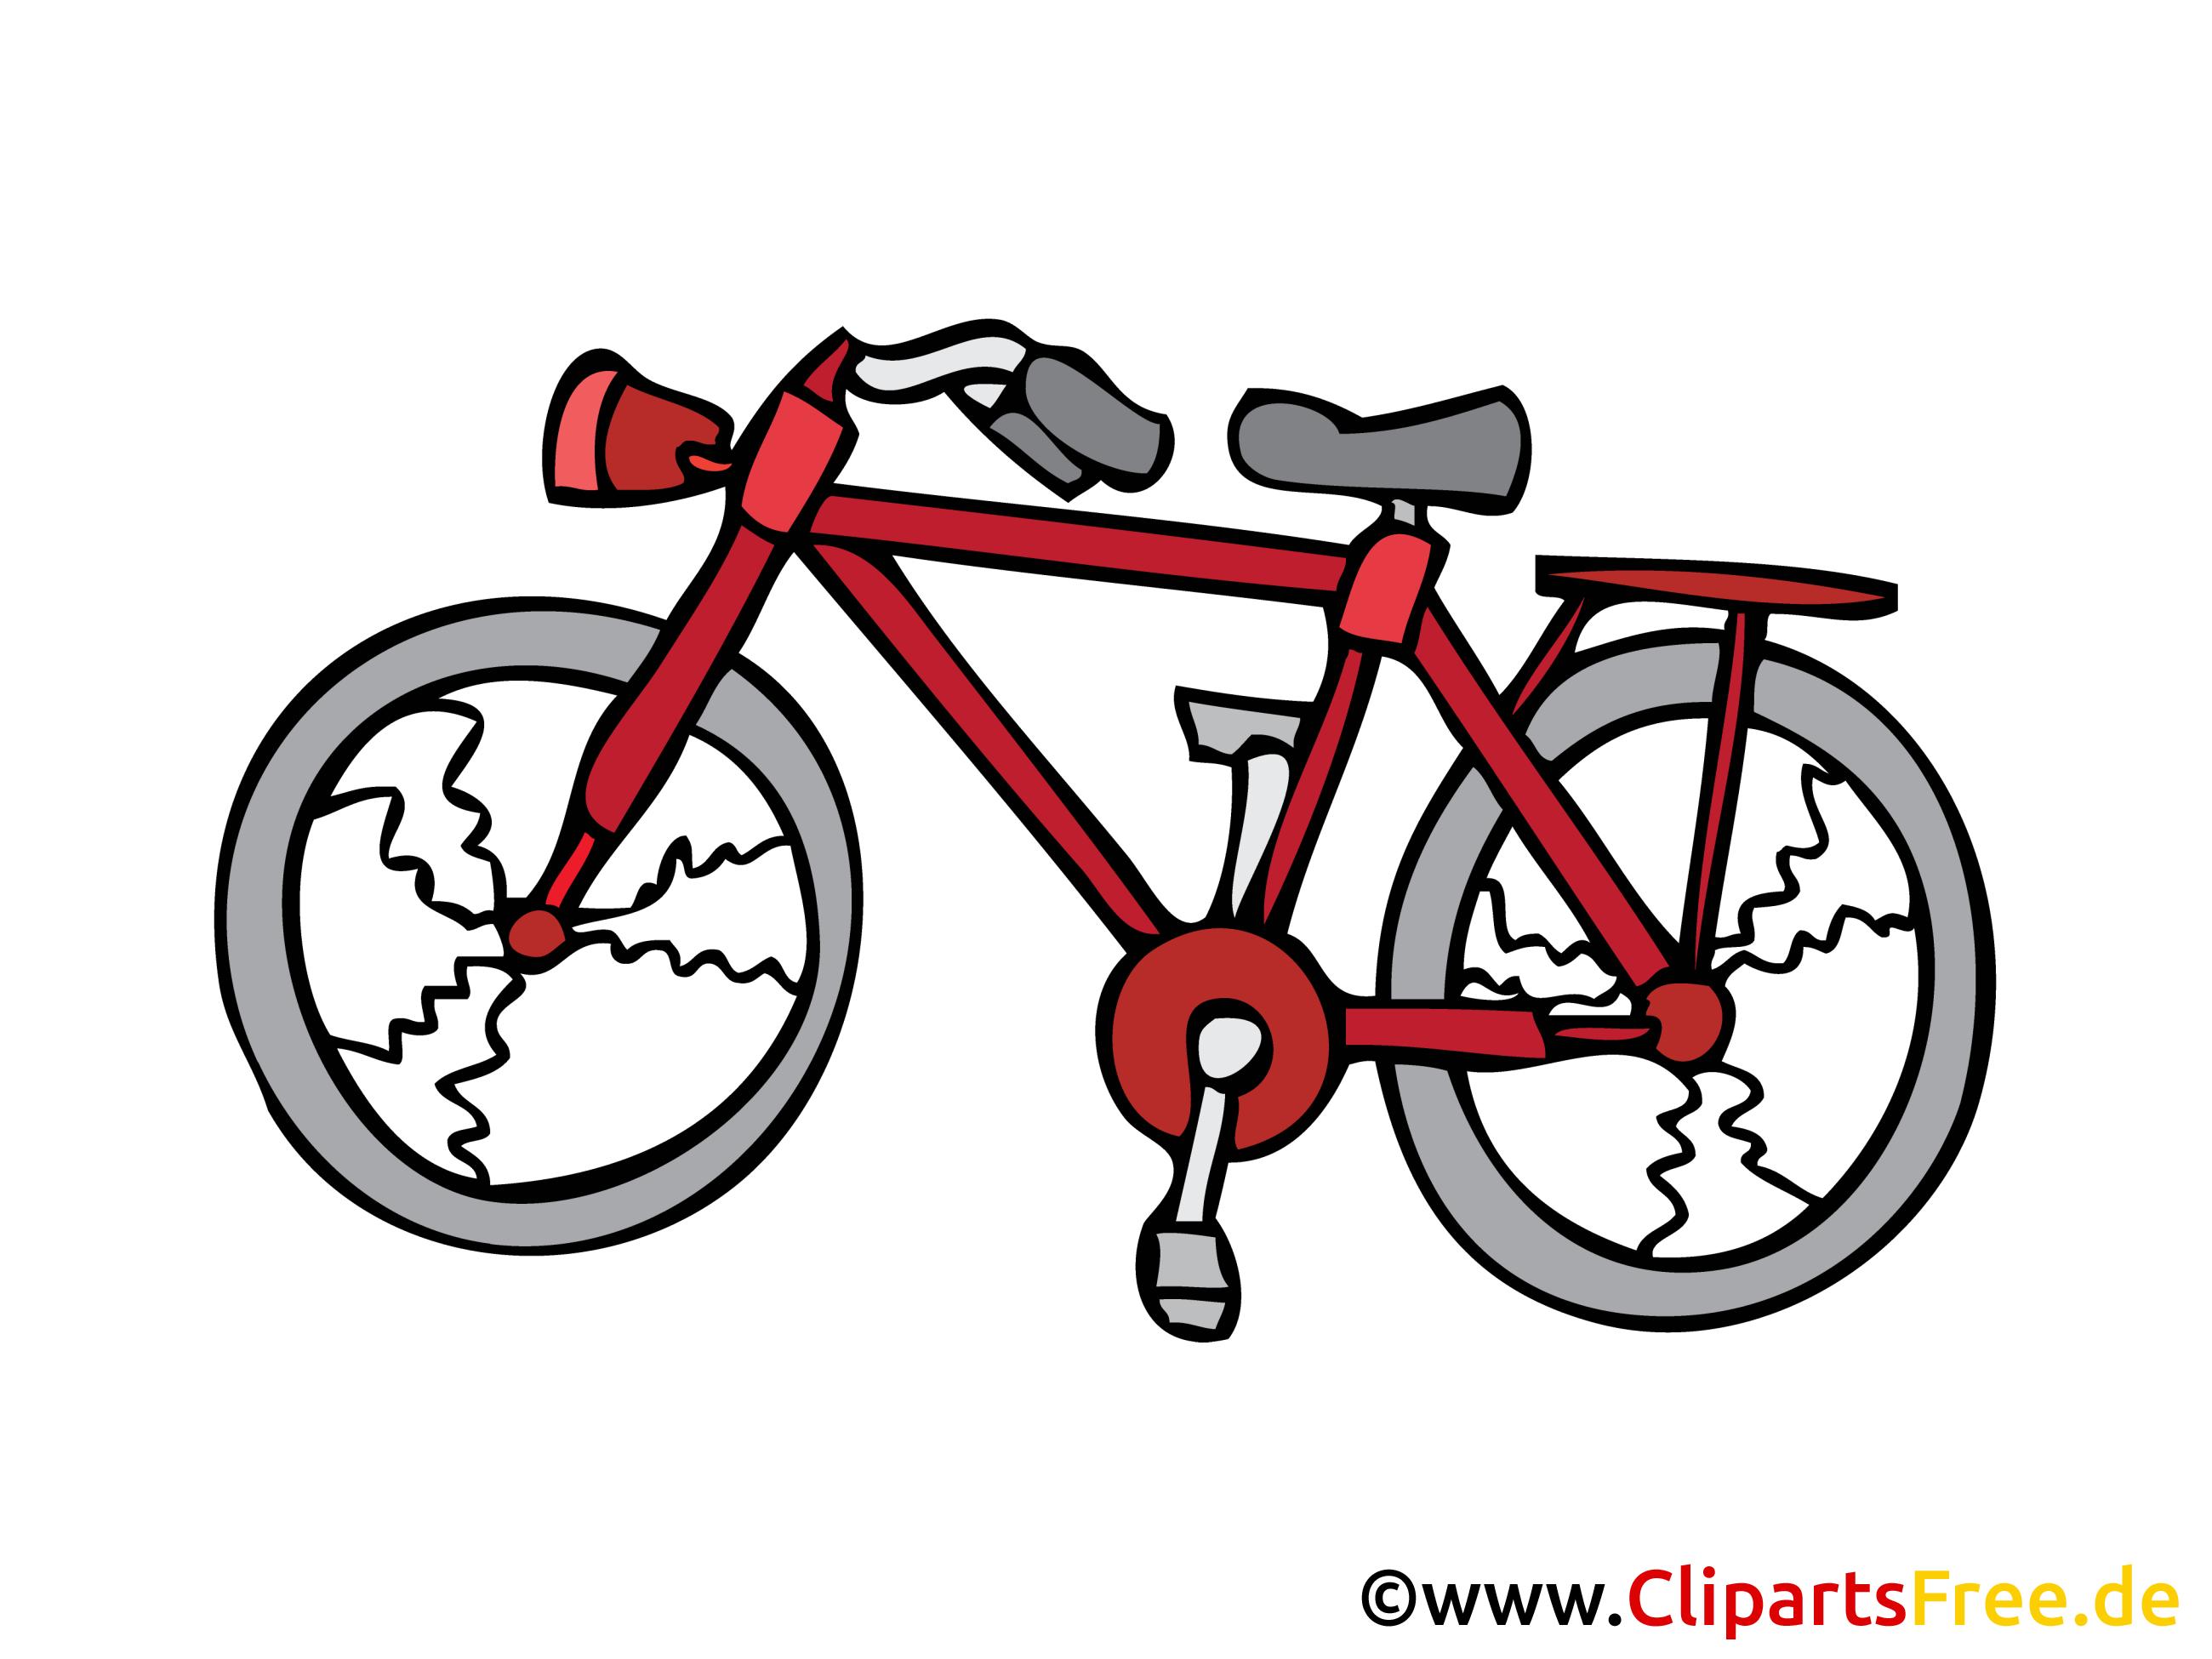 http://www.clipartsfree.de/images/joomgallery/details/transport_5/fahrrad_bild_clipart_illustration_grafik_zeichnung_kostenlos_20151001_2028363344.png